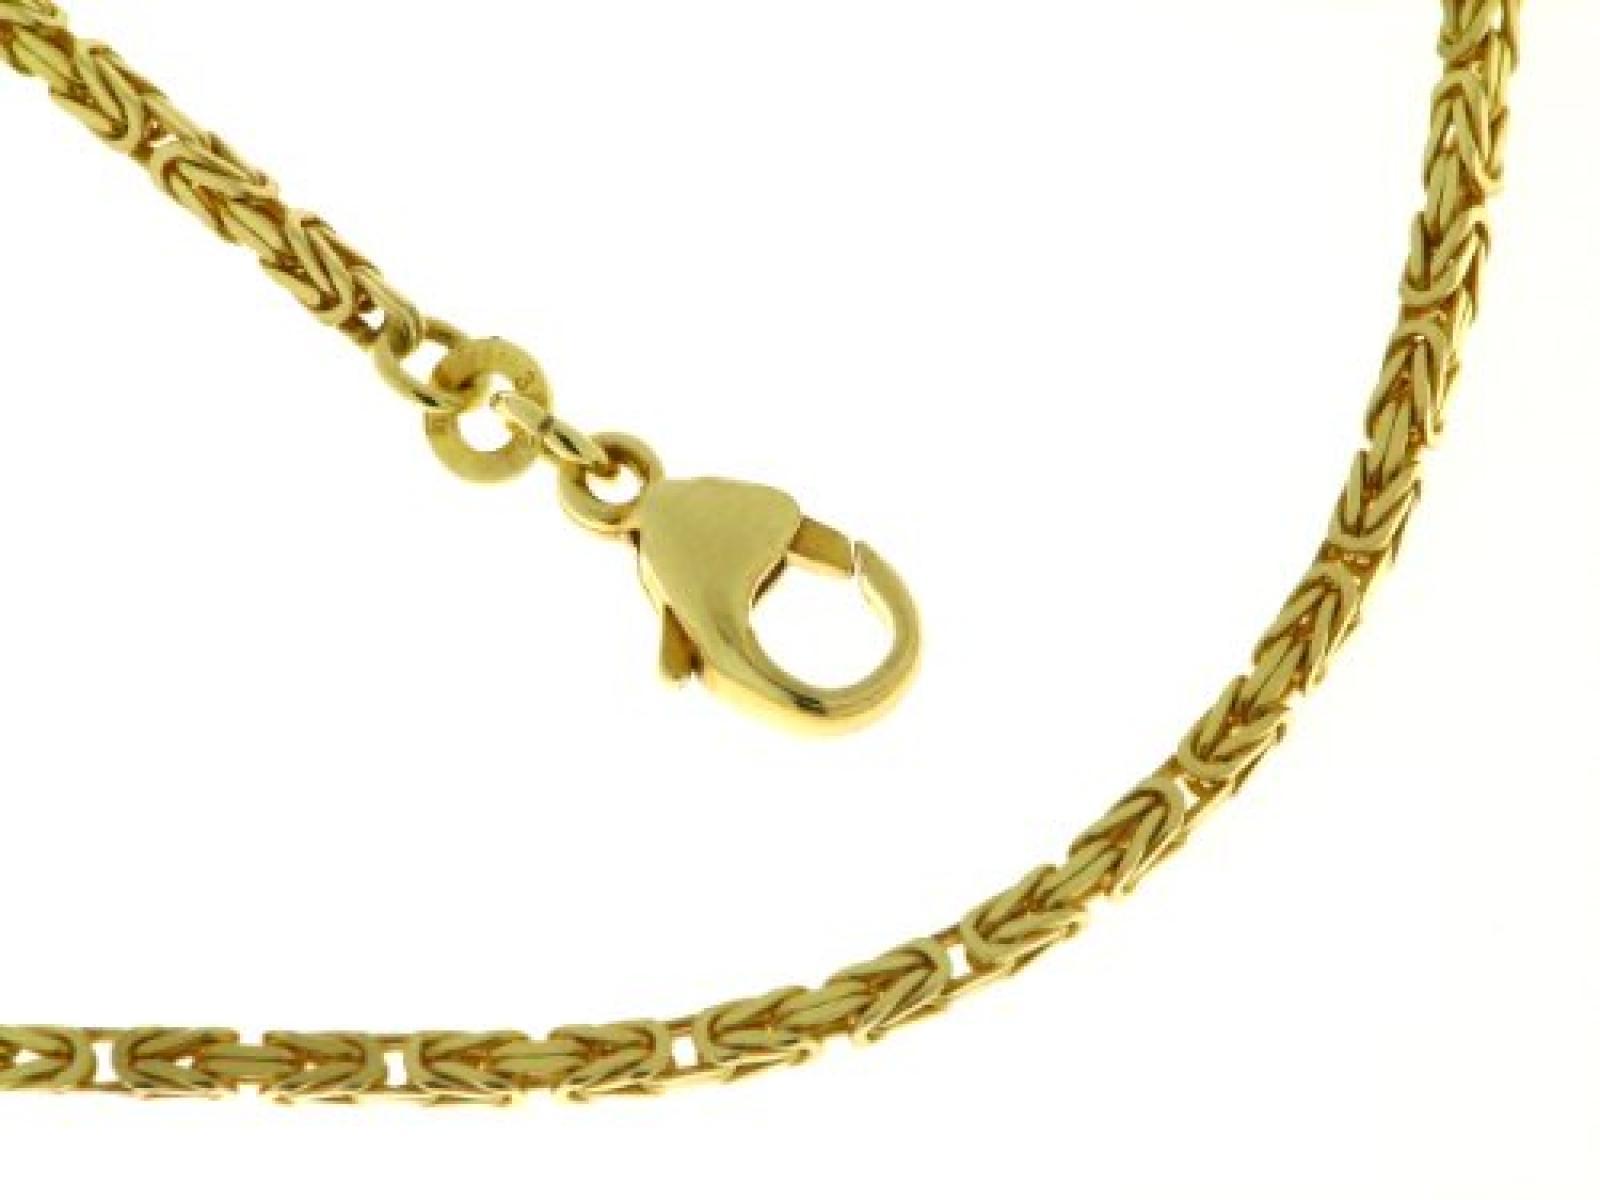 BOB C. Königskettenarmband  quadratisch 1,8 mm 333/ooo Gelbgold ca. 21 cm 122197